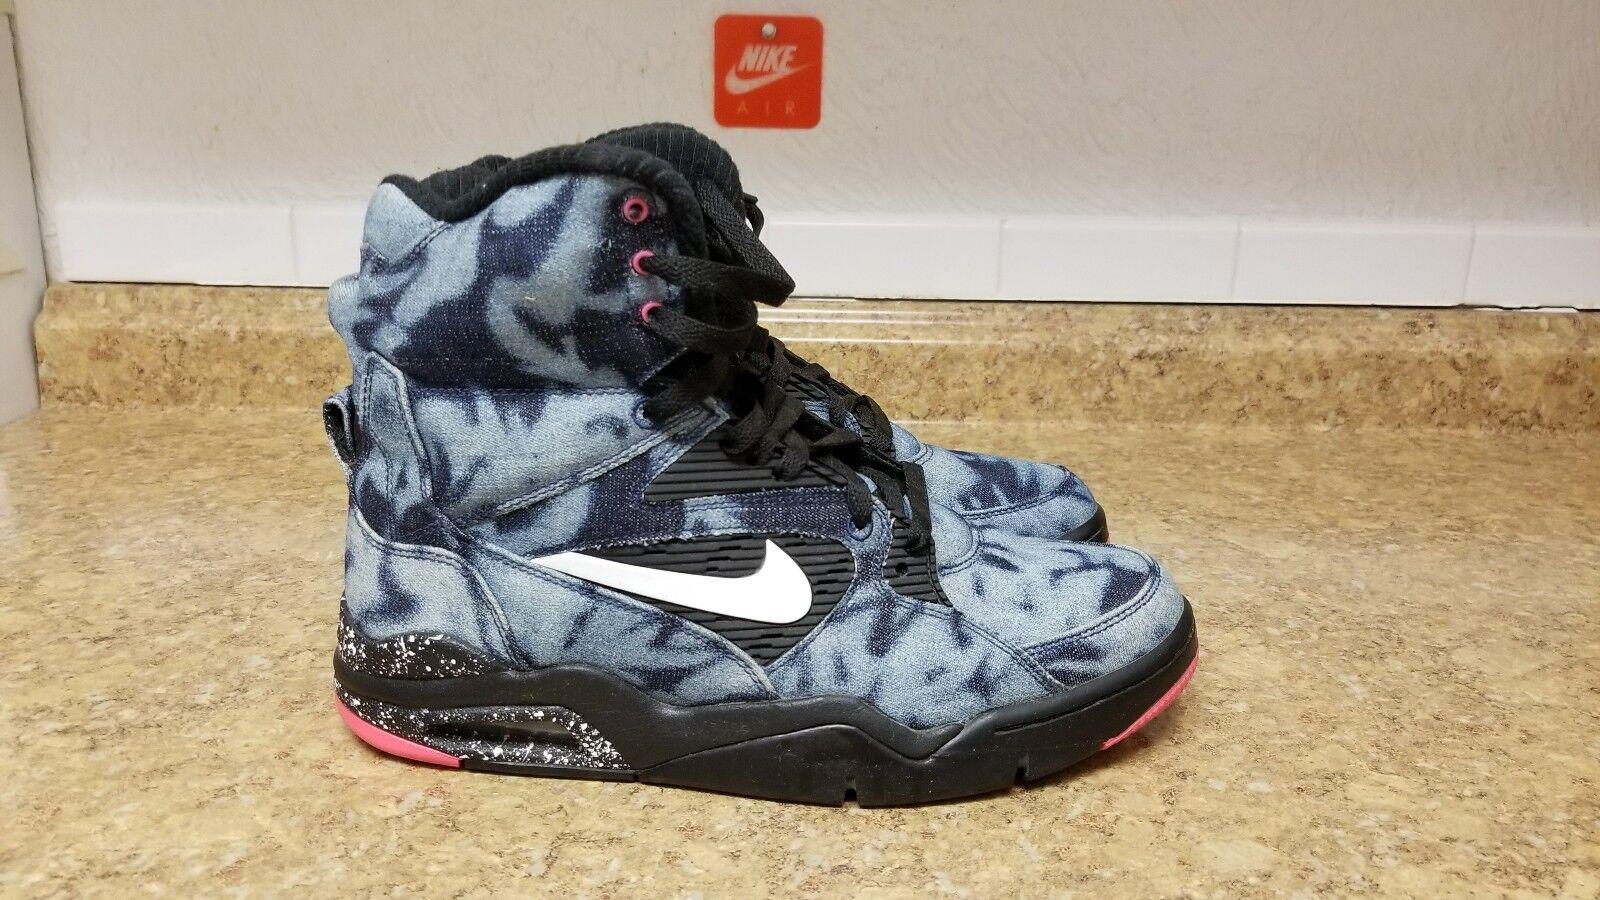 Nike Air Command Force Acid Wash Denim Black Pink shoes (684715 002) - Sz 9